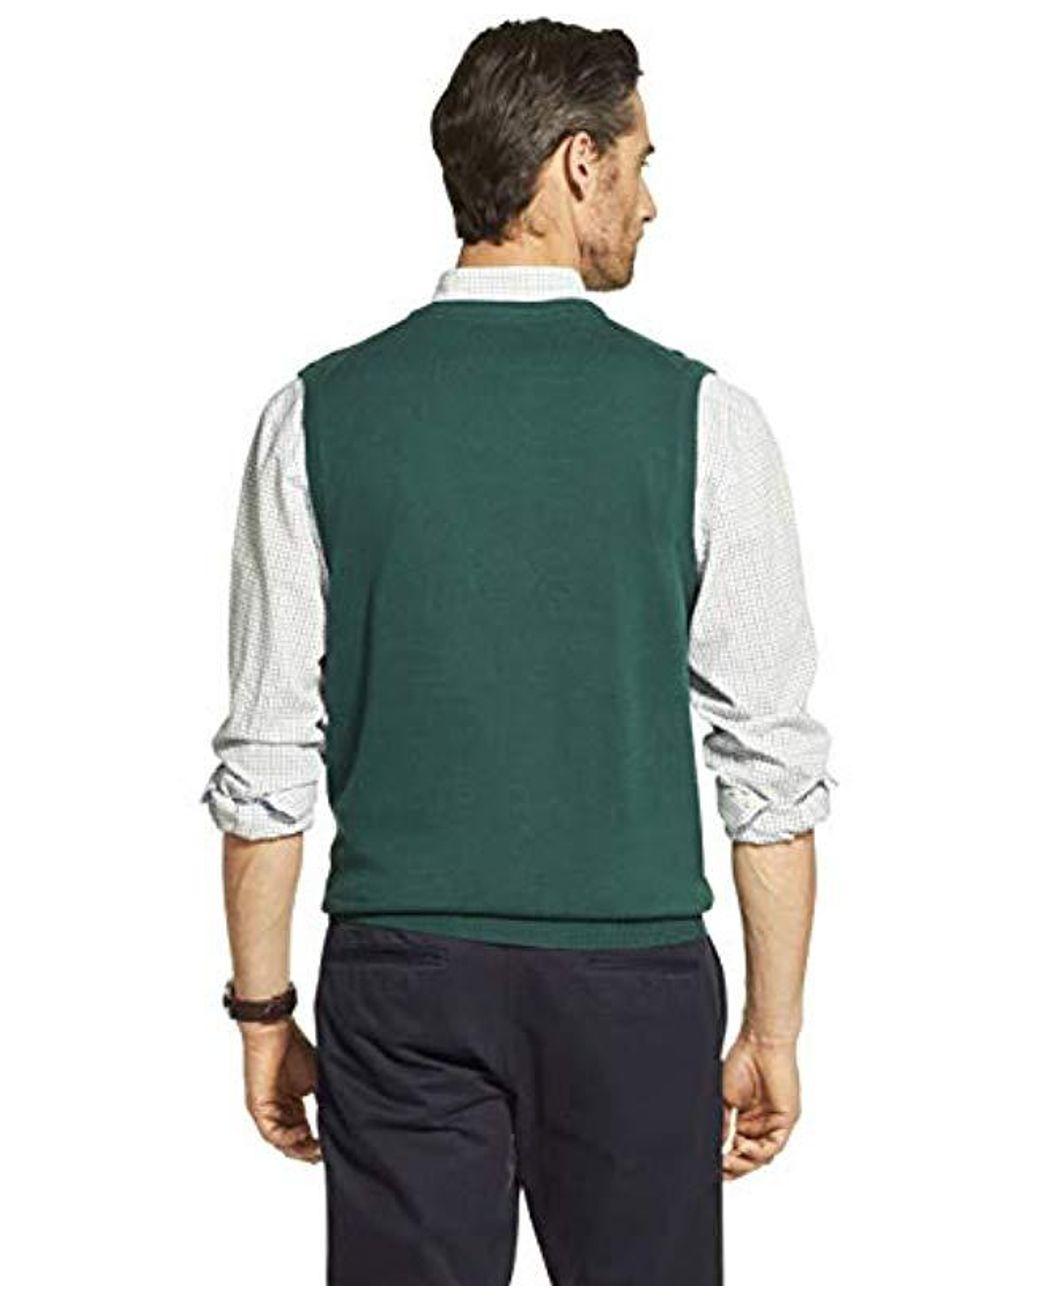 Izod Mens Premium Essentials Solid V-Neck 12 Gauge Sweater Vest Sweater Vest